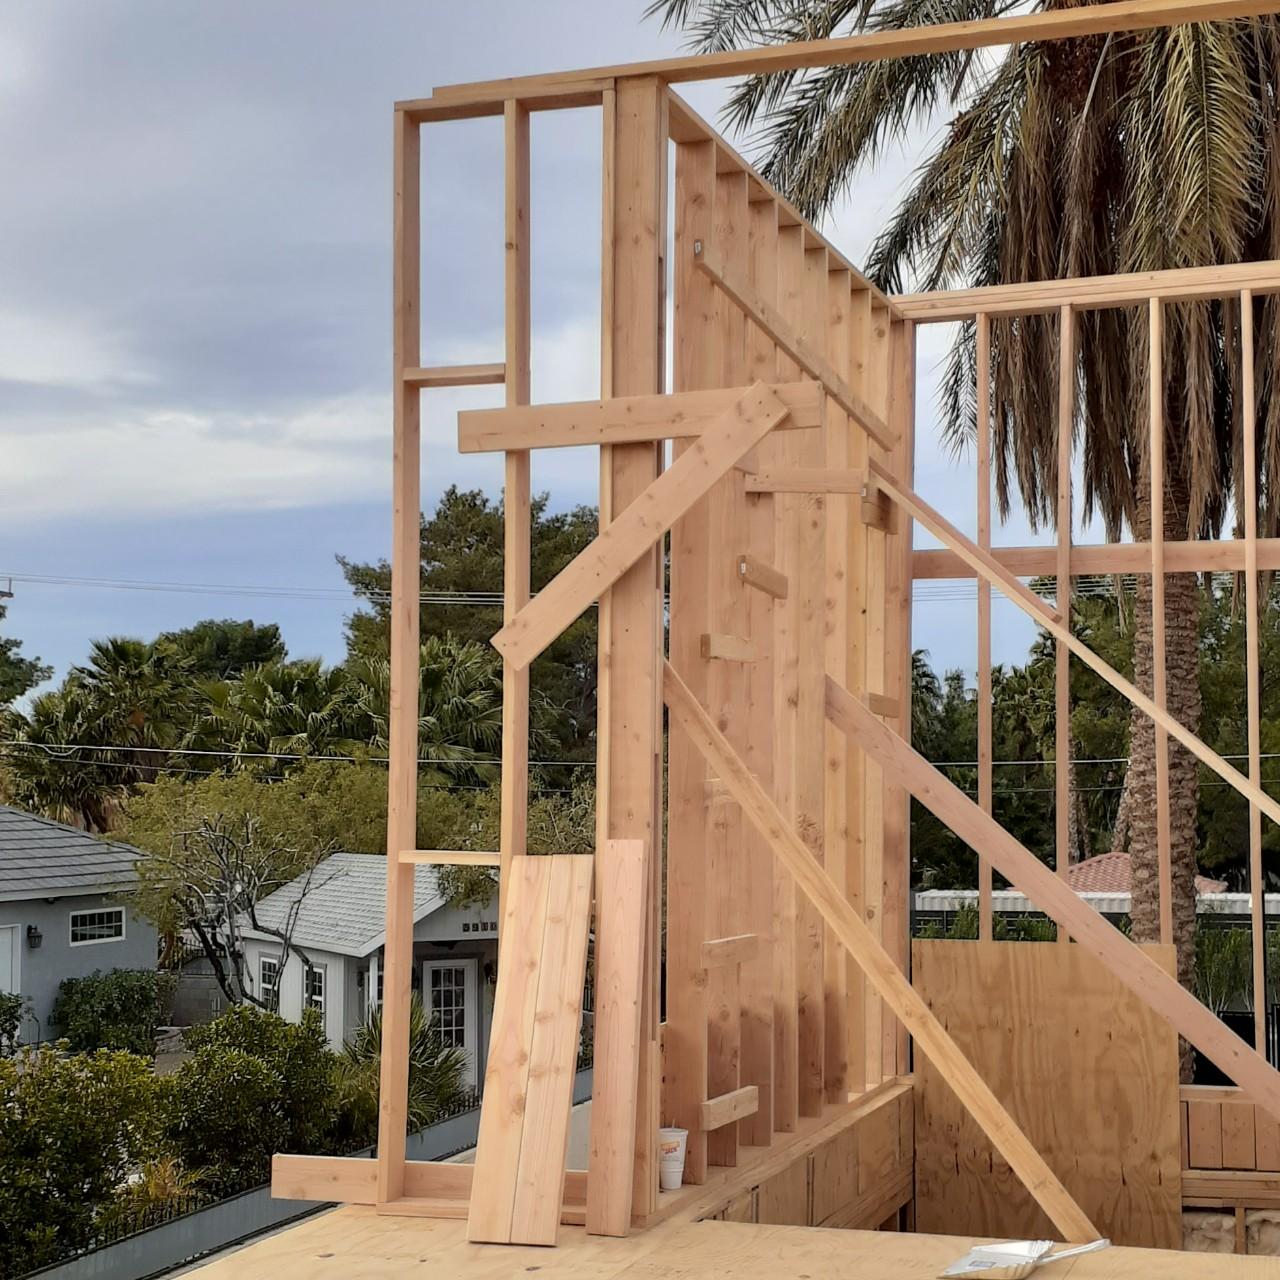 carpentry-wood-framing-second-floor-home-addition--framing-74